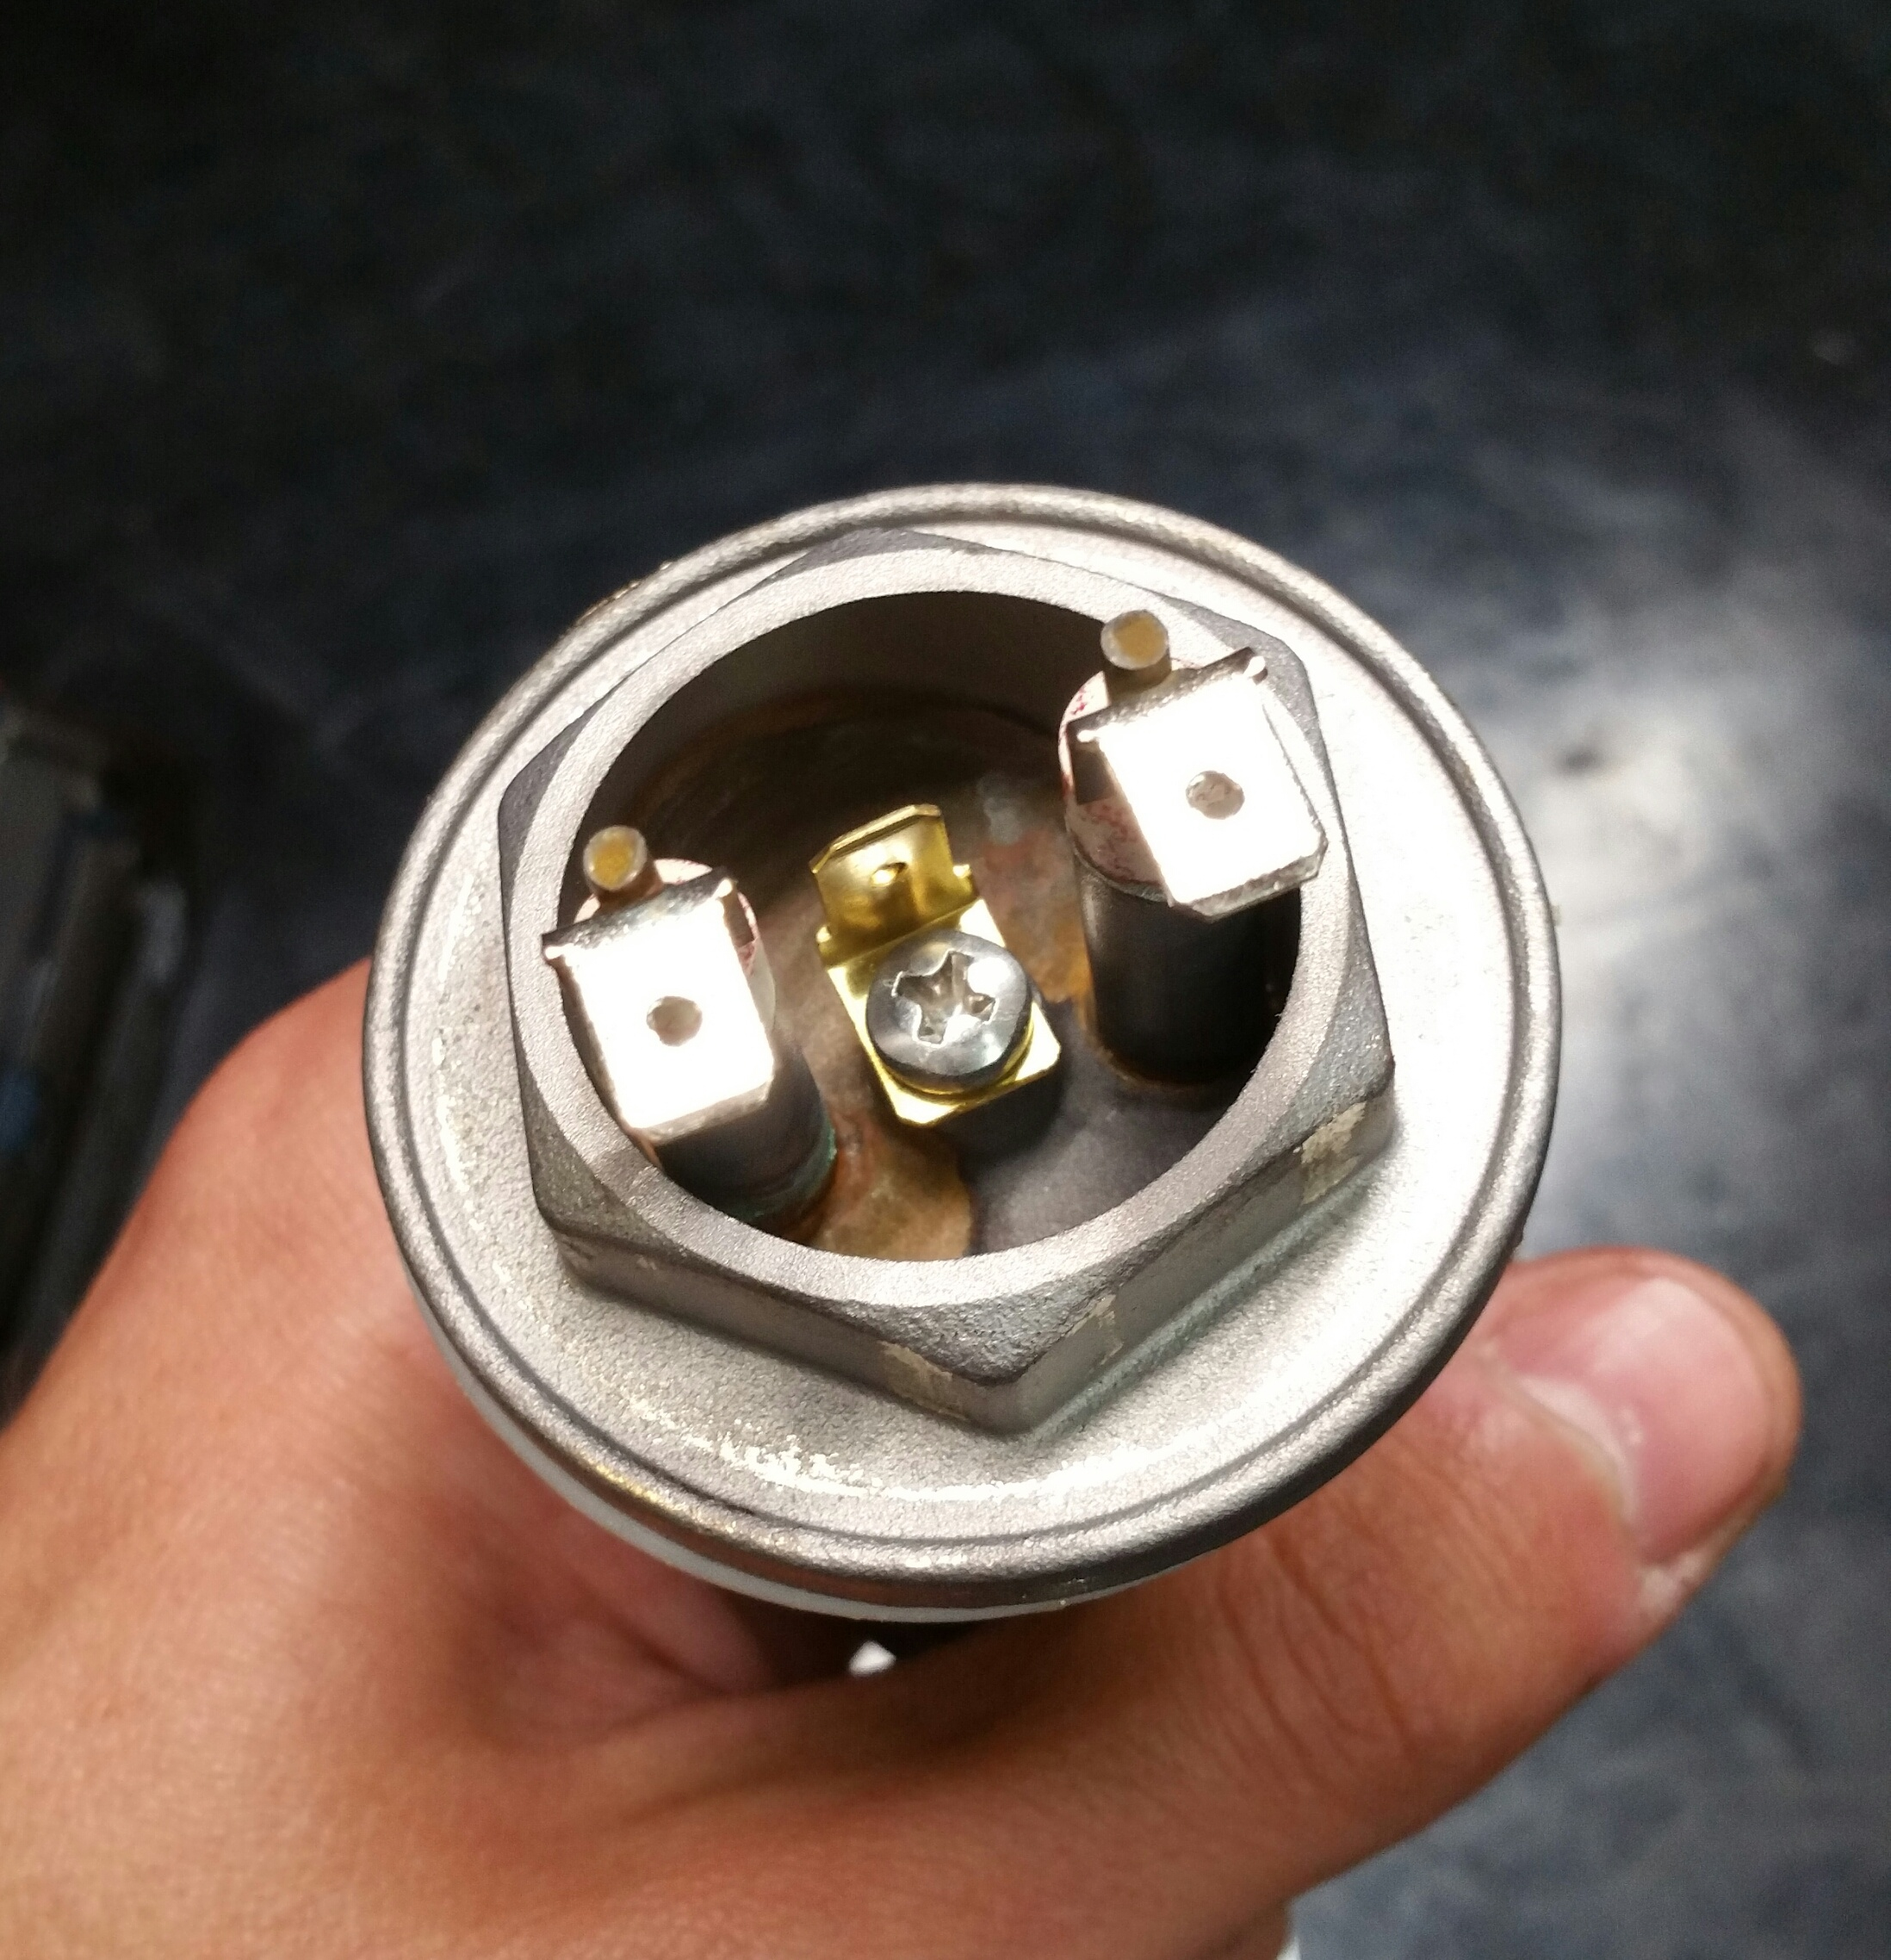 LUCCA M58: Replacing Steam Boiler Element